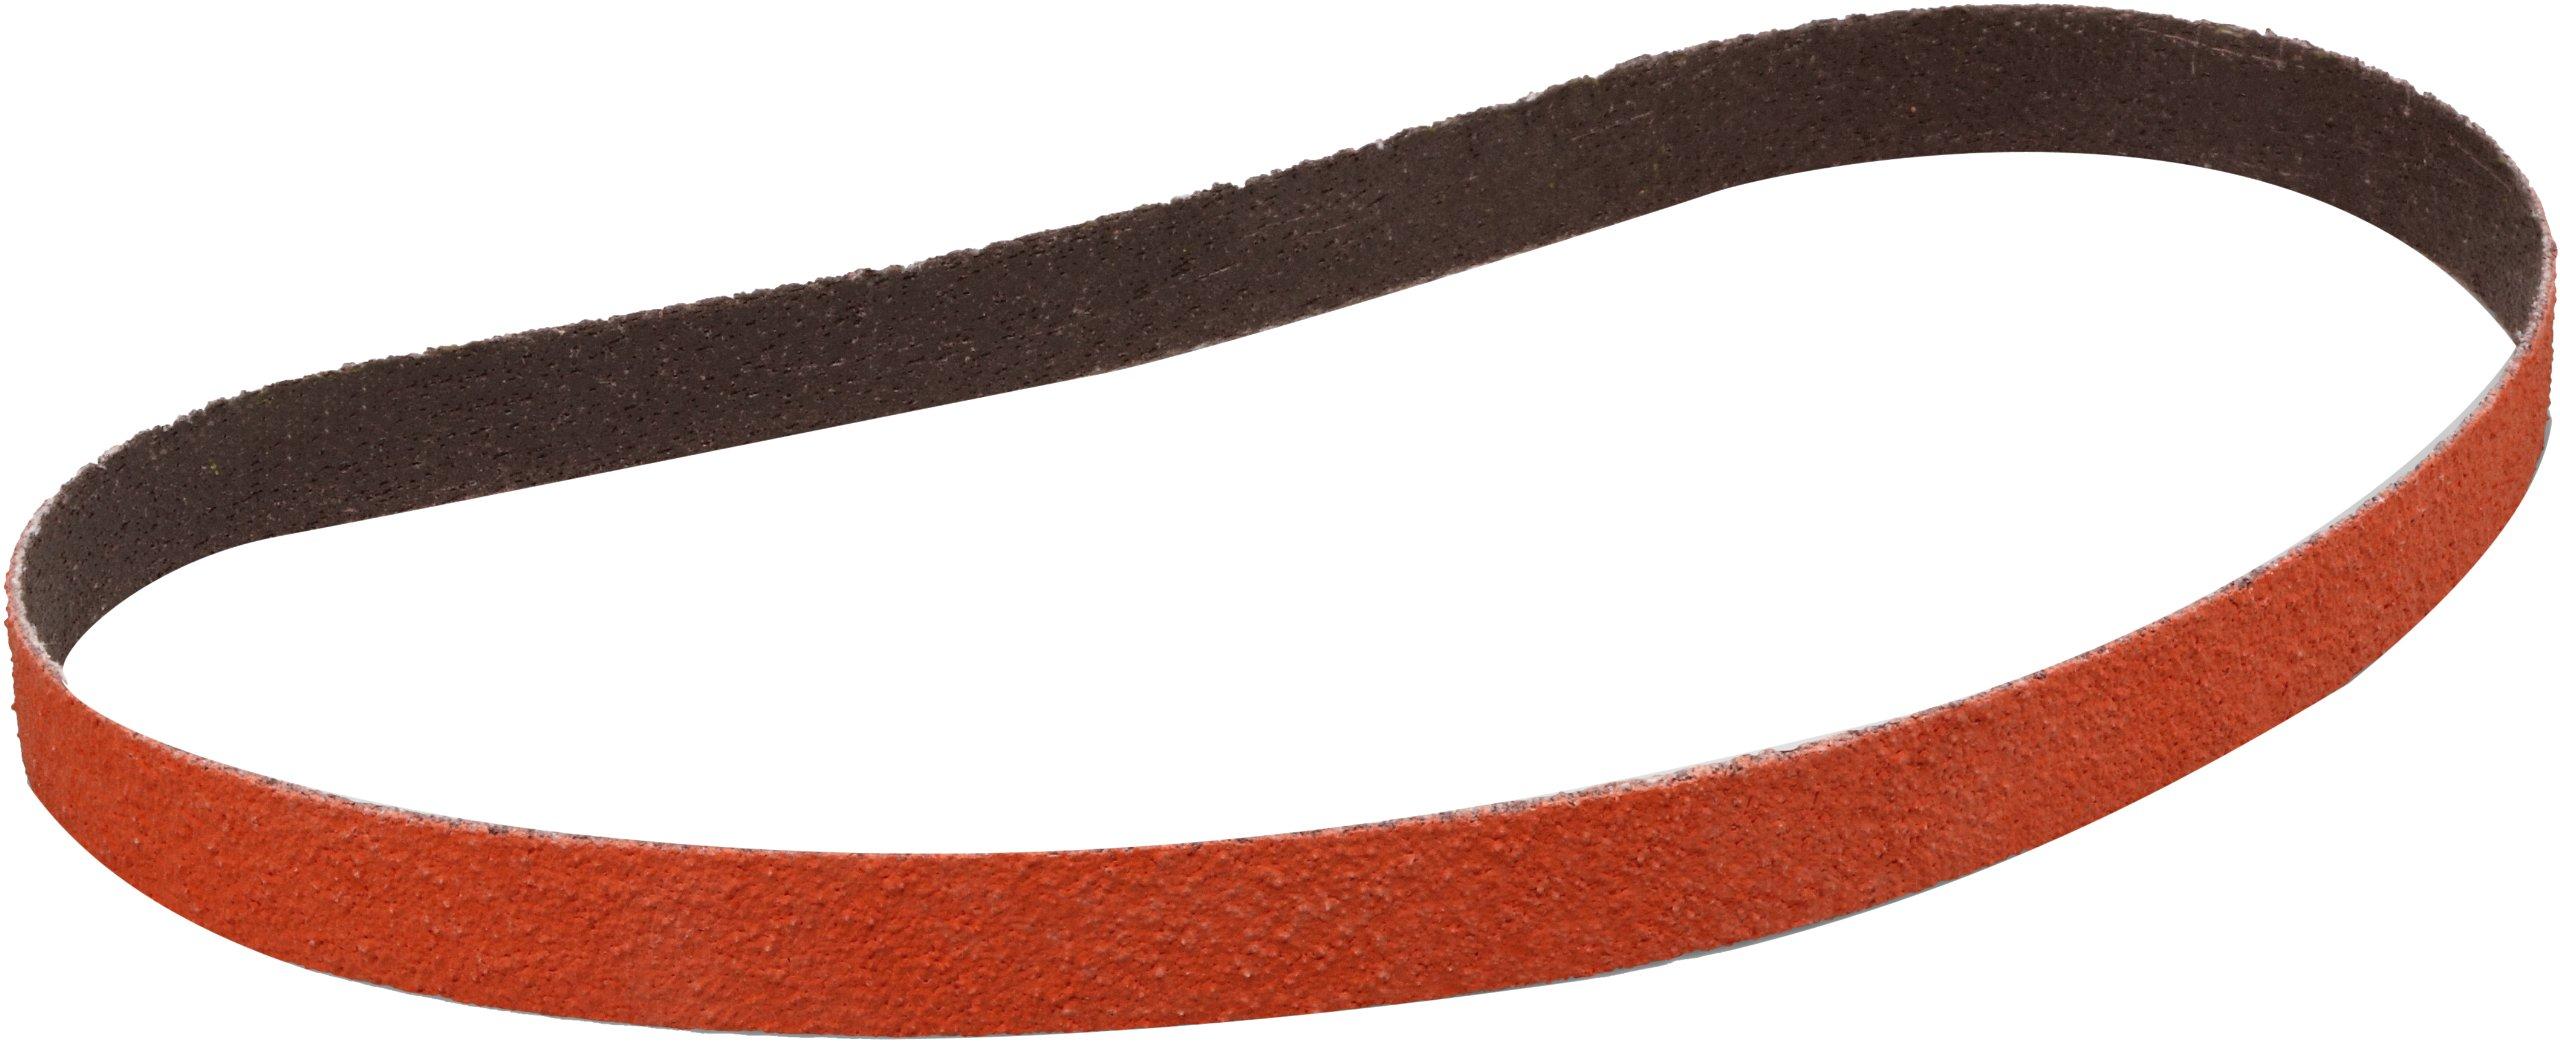 3M(TM) Cloth Belt 777F, Ceramic Grain, Wet/Dry, 3/4'' Width x 18'' Length, 36 Grit, Orange (Pack of 200)